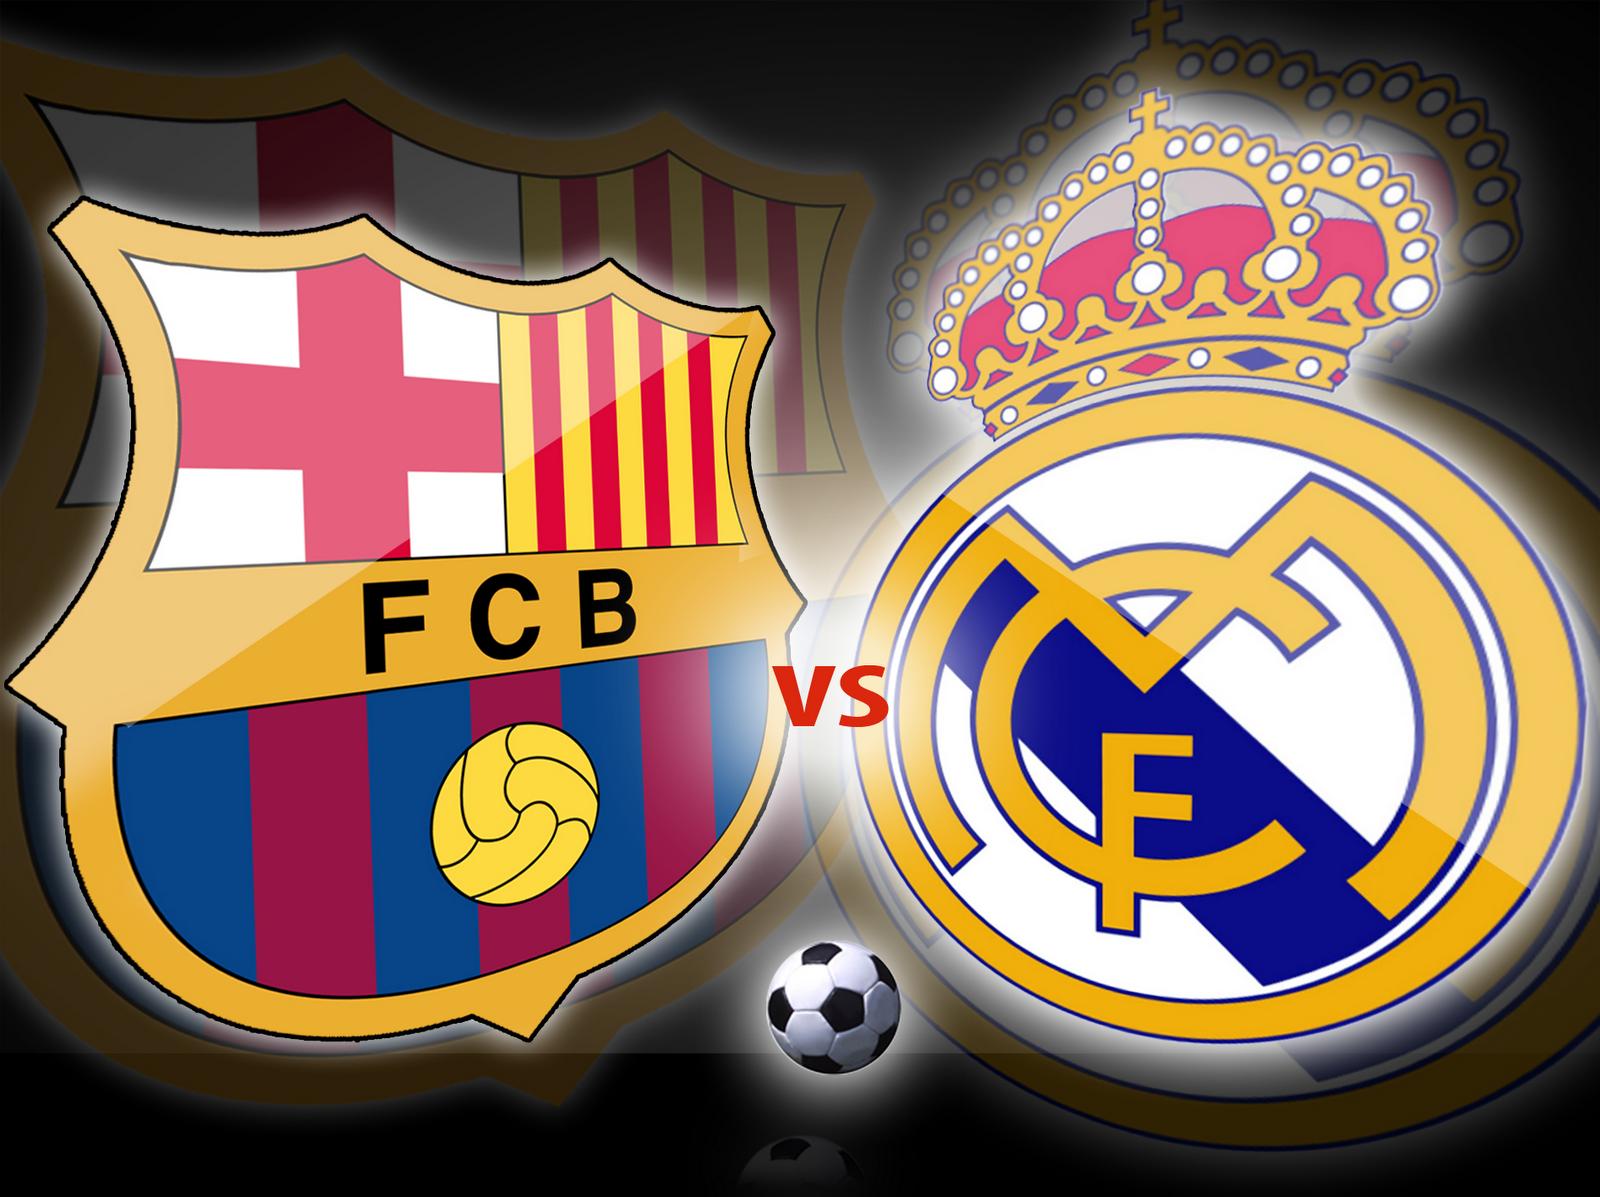 Gambar Dp Bbm El Clasico Real Madrid Vs Barcelona